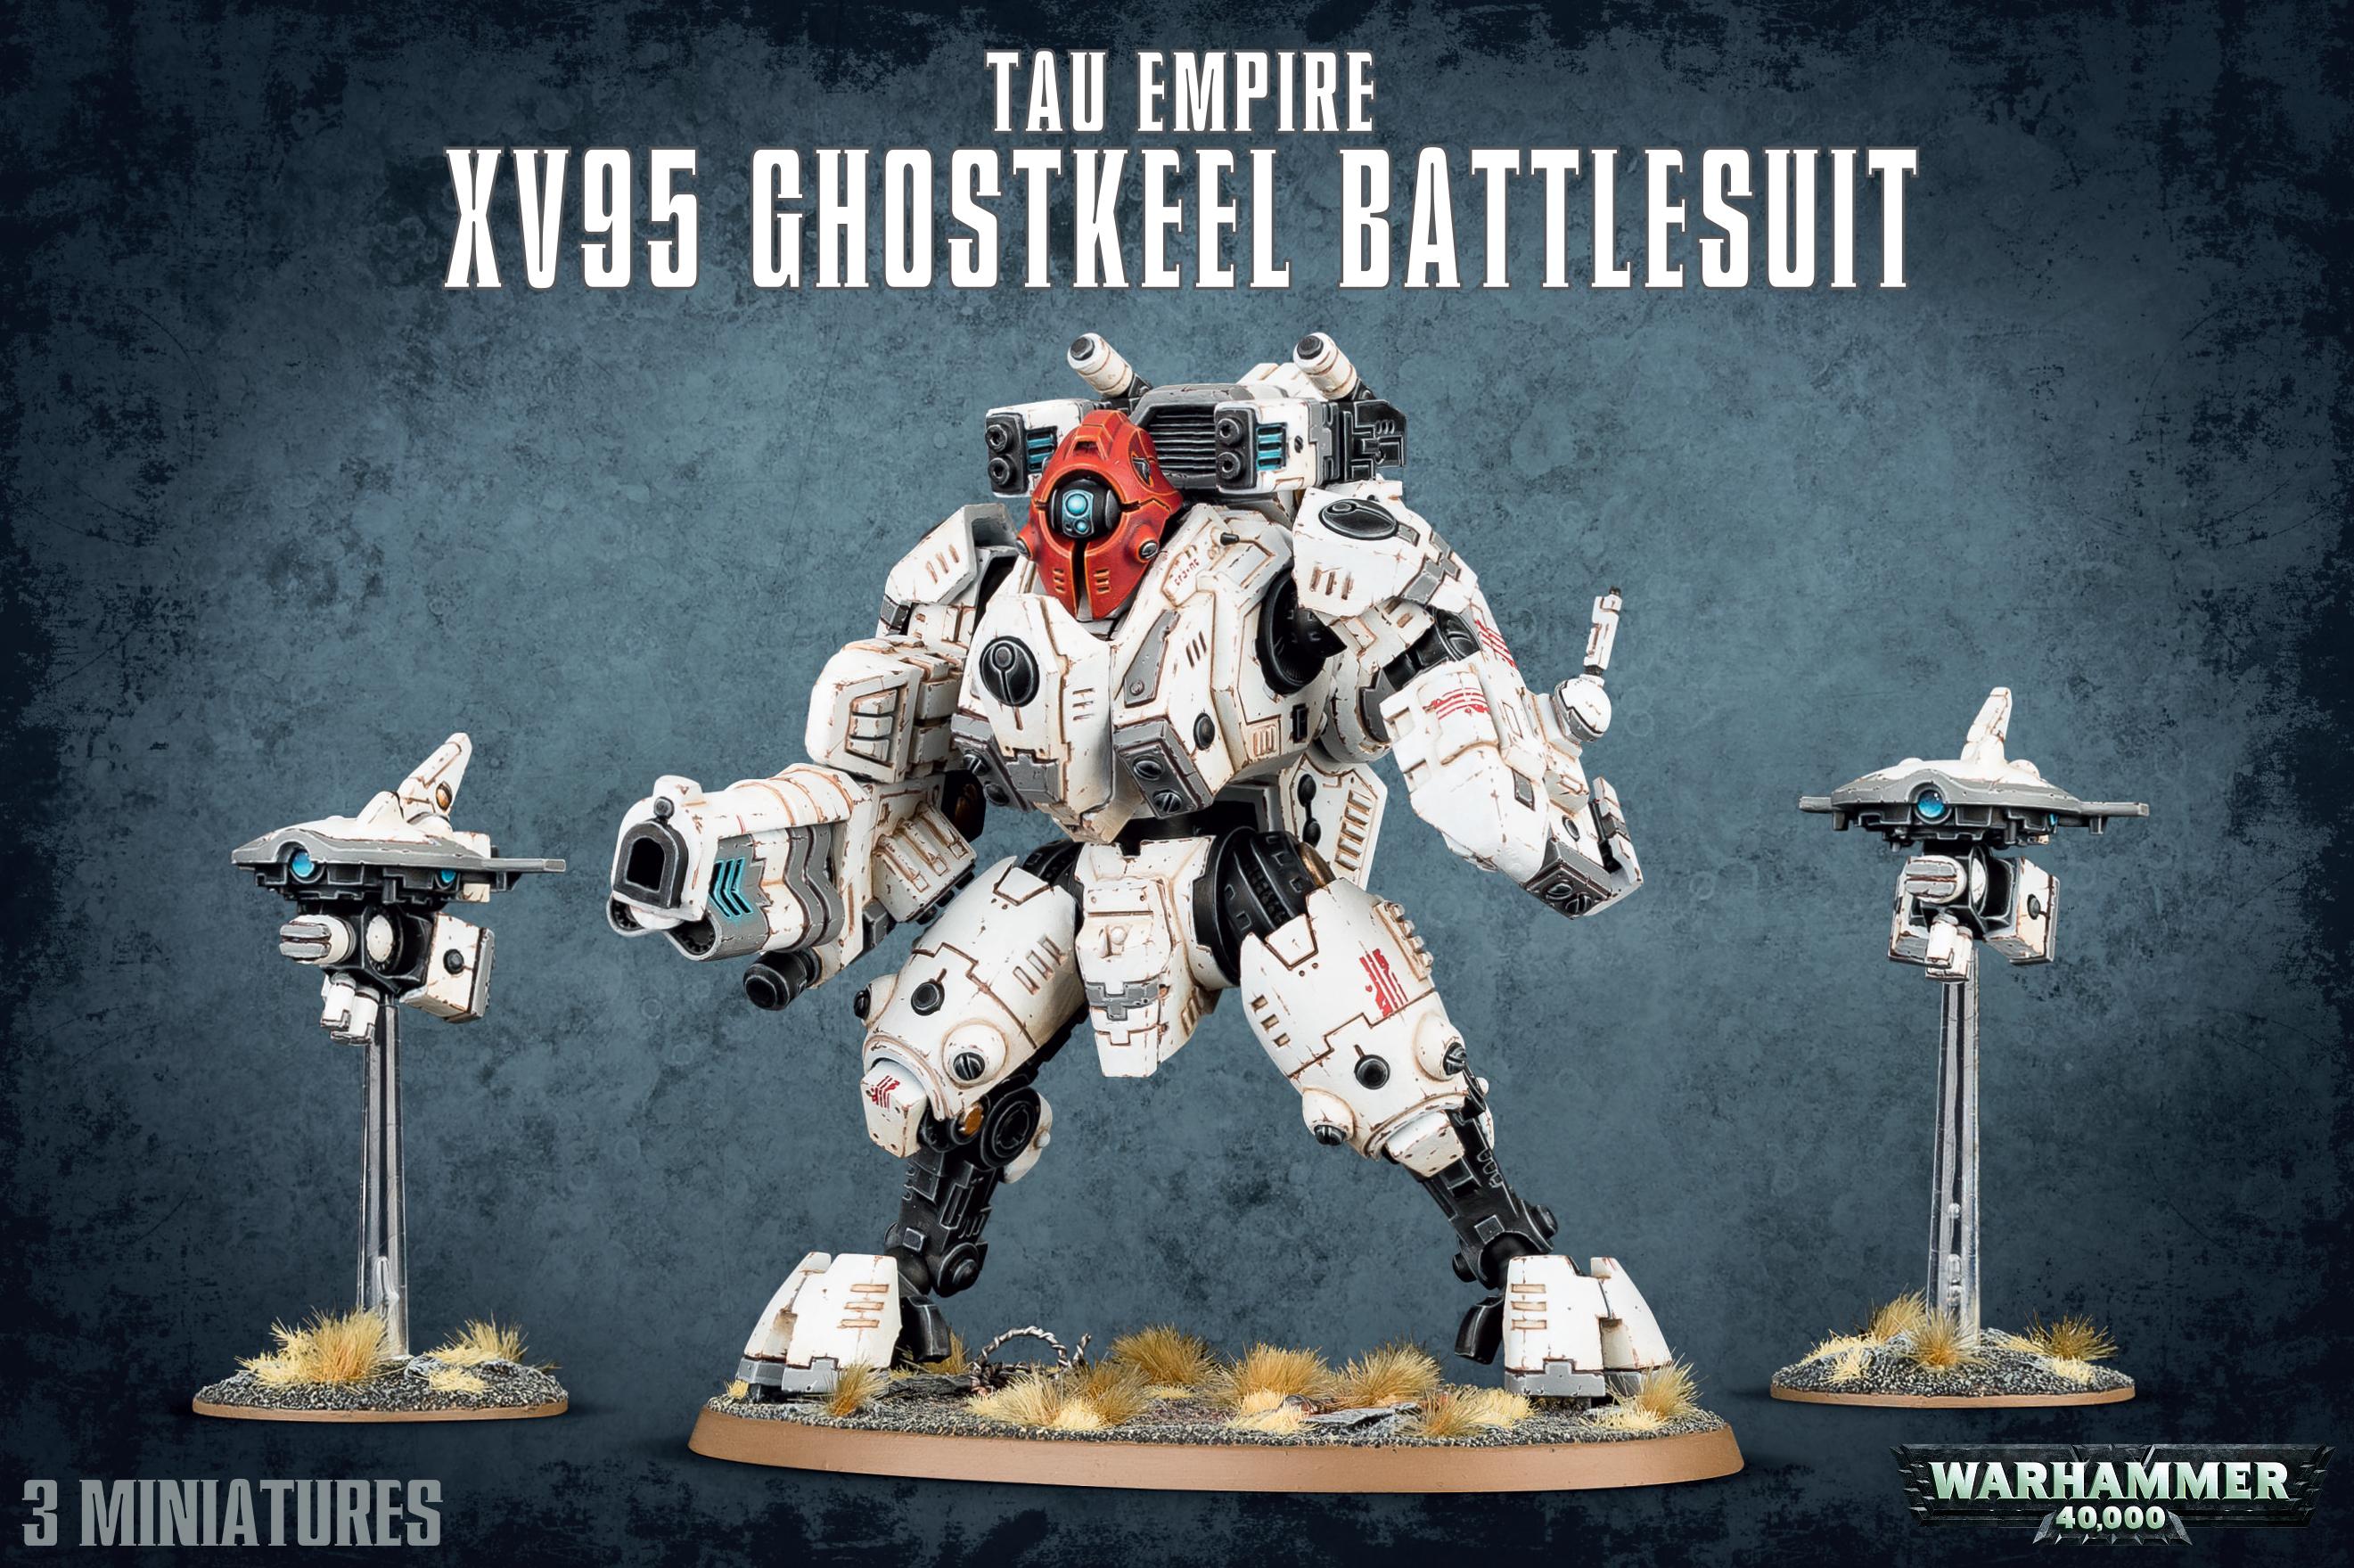 XV95 Ghostkeel Battlesuit, Tau Empire